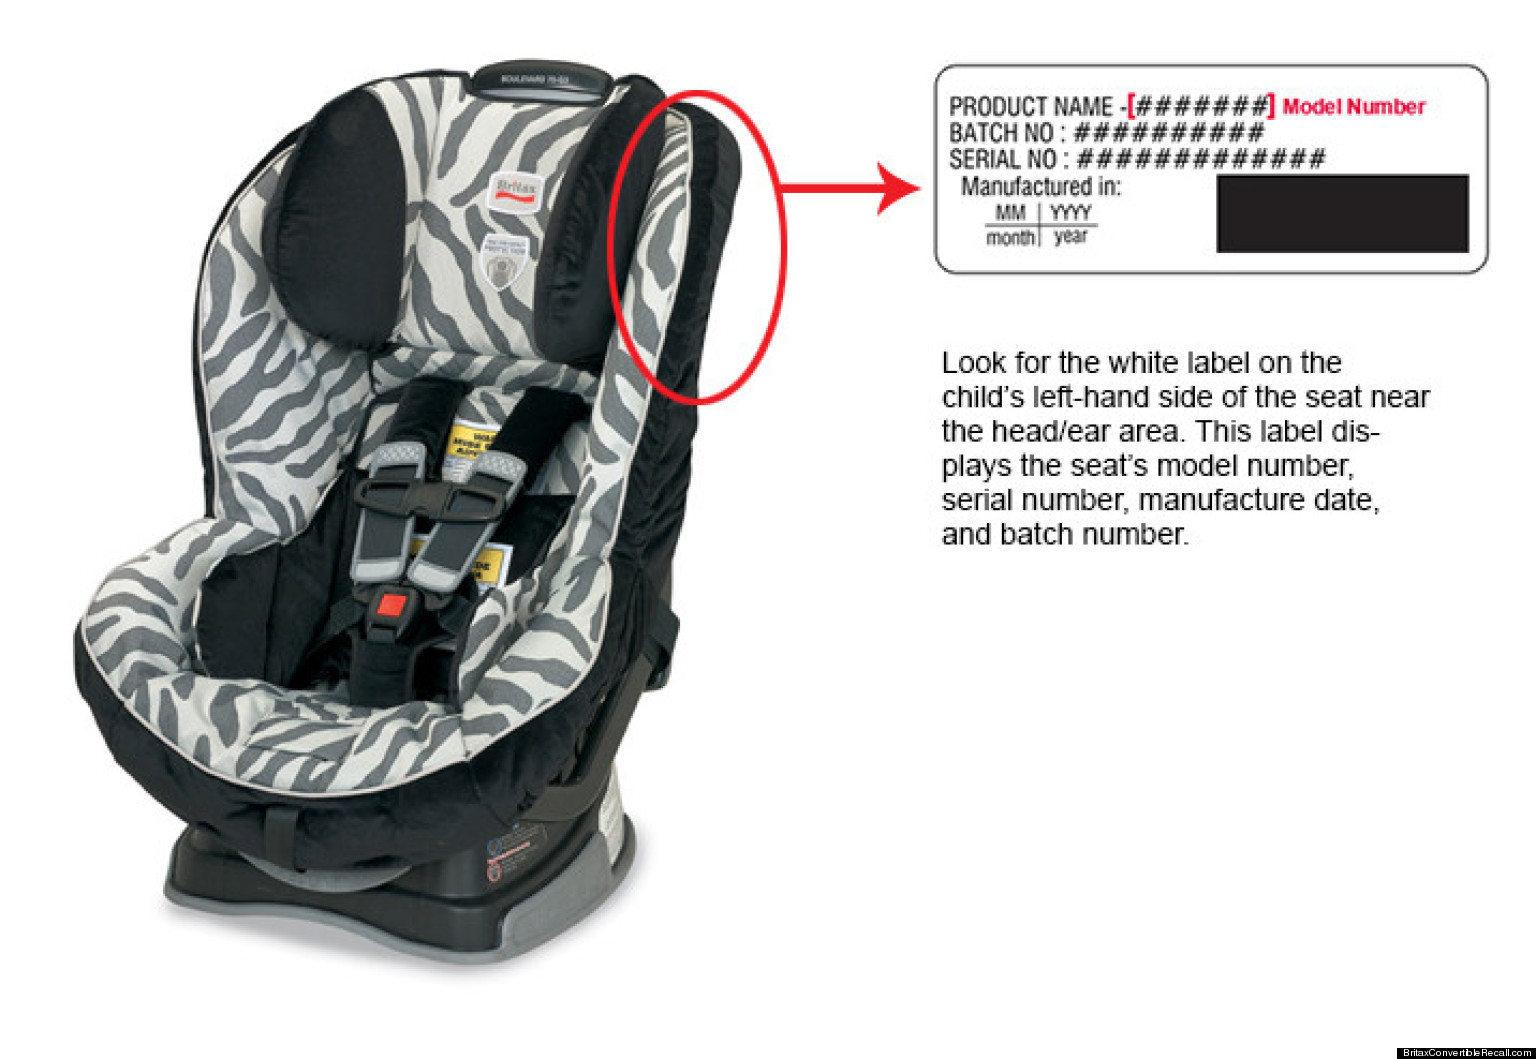 Britax car seat expiration date in Sydney